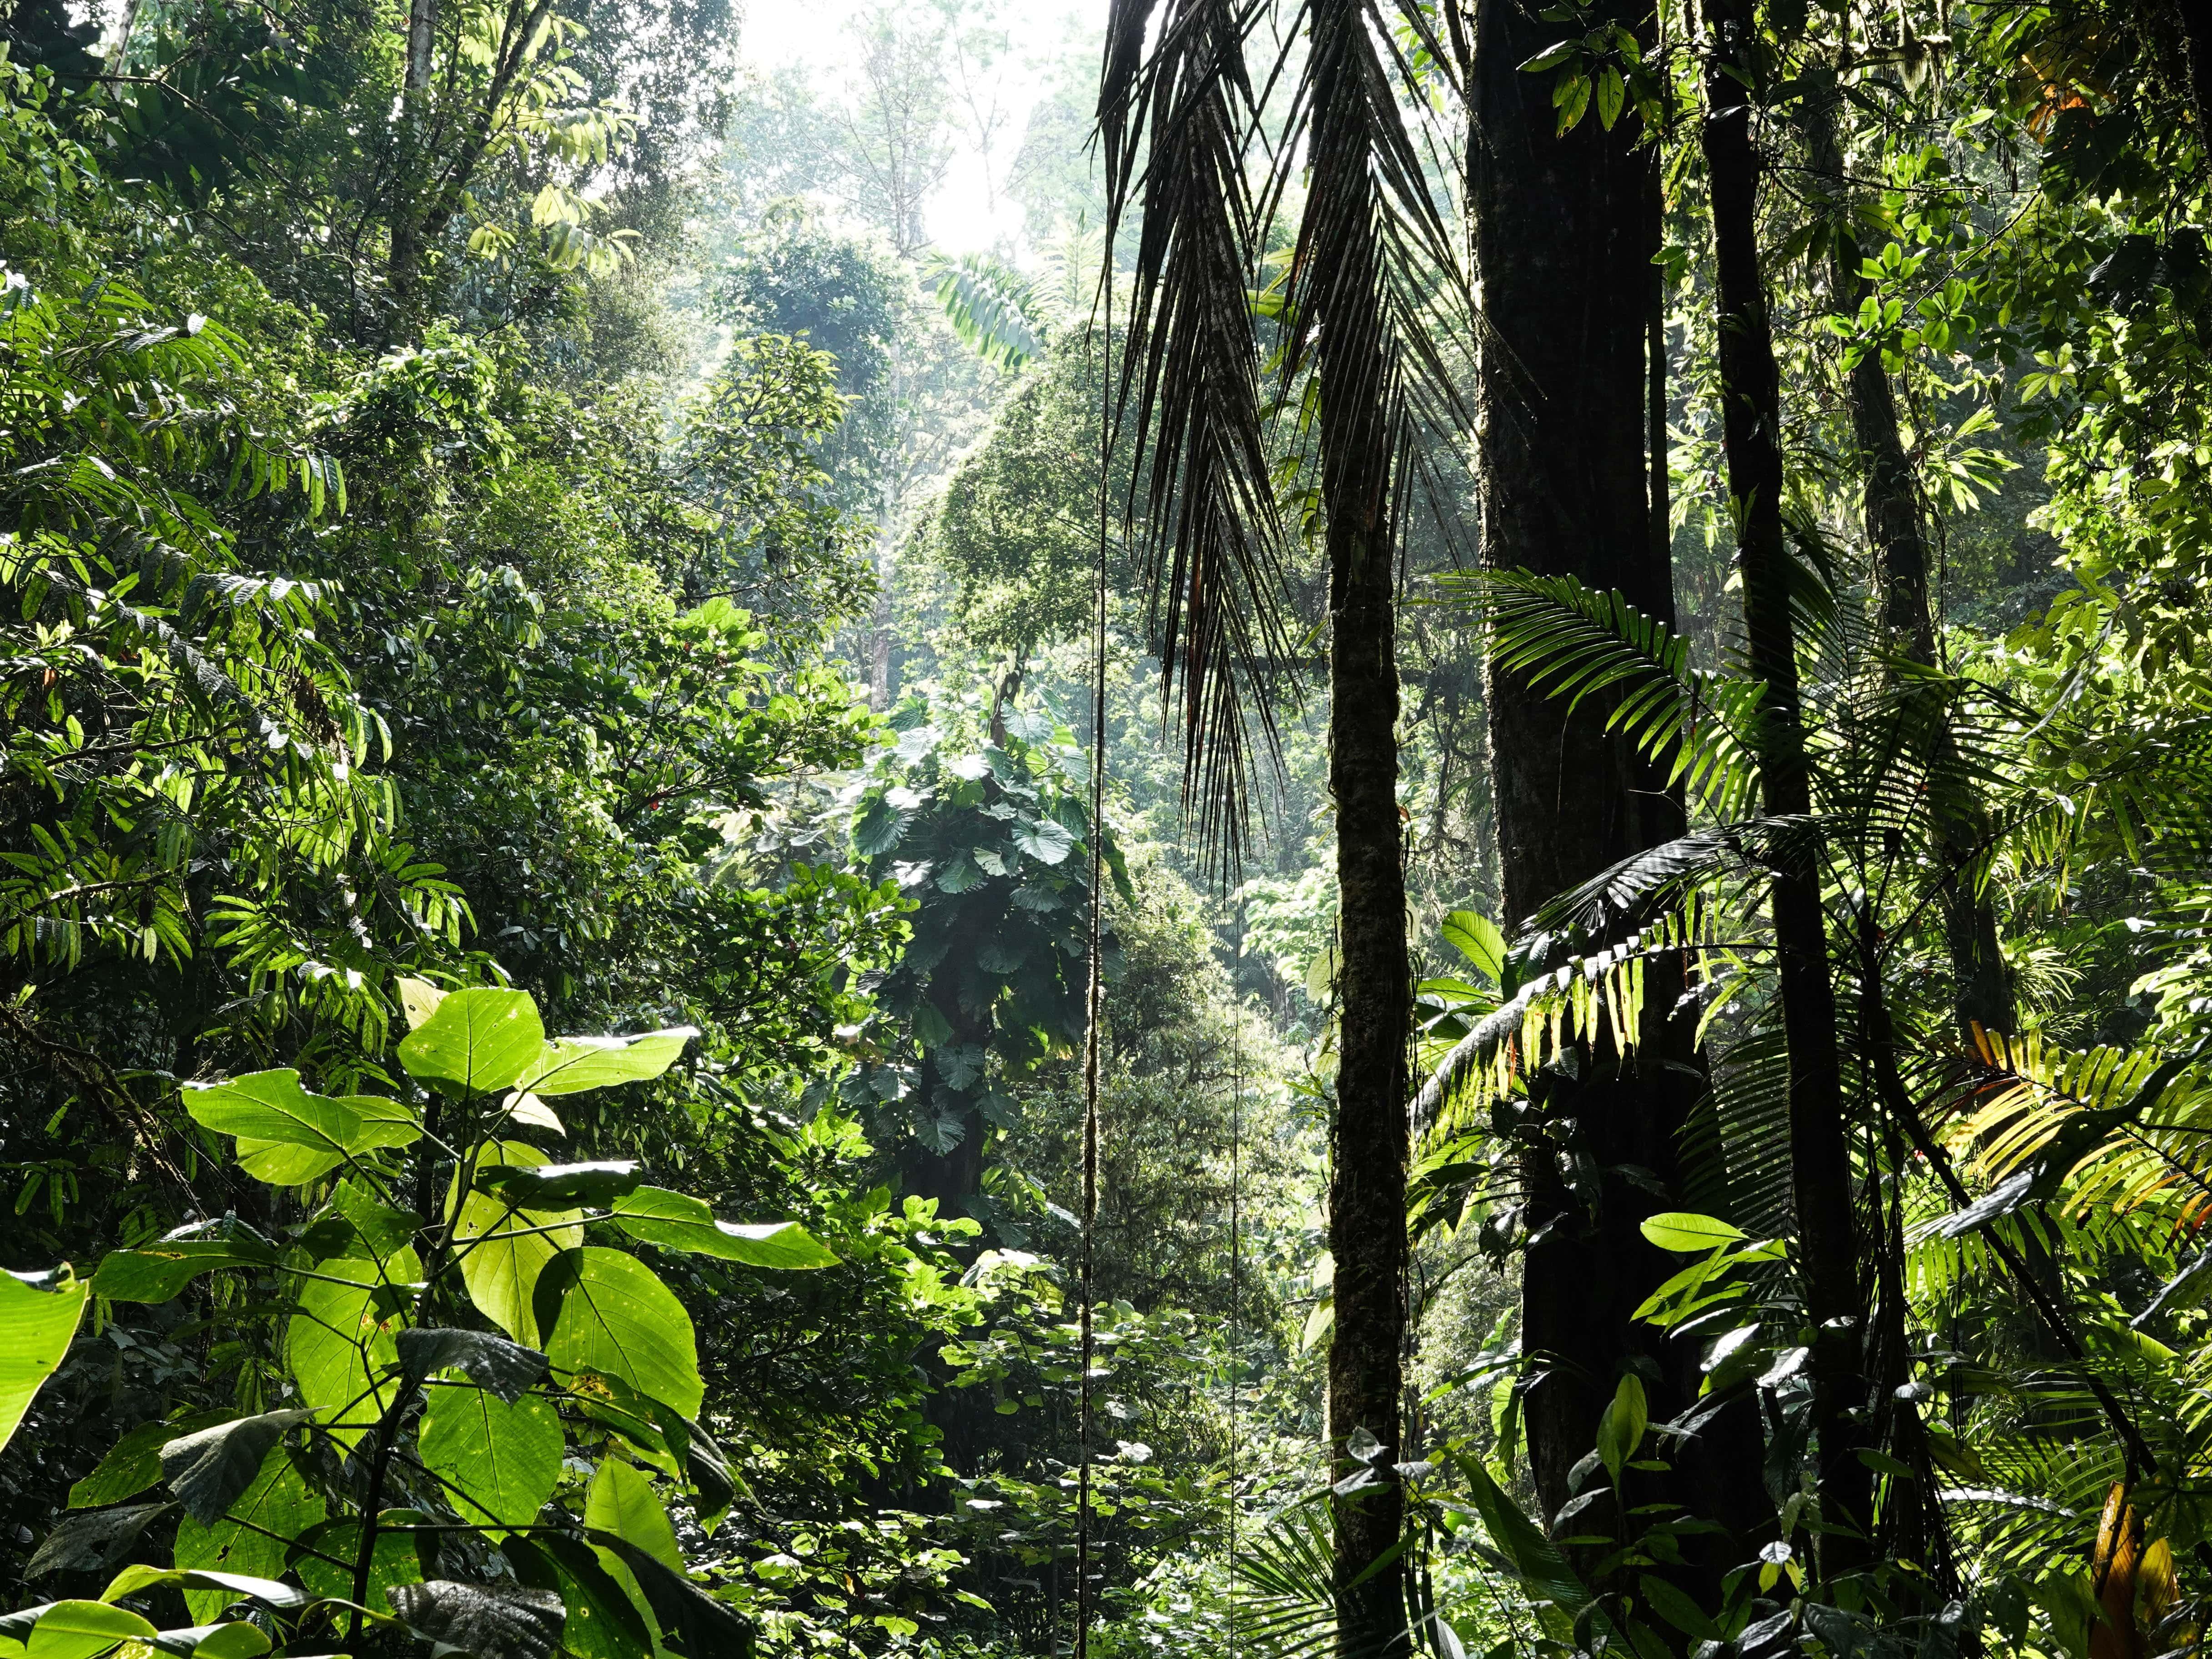 In the Spotlight, June 2021 - Momentum gathers behind biodiversity